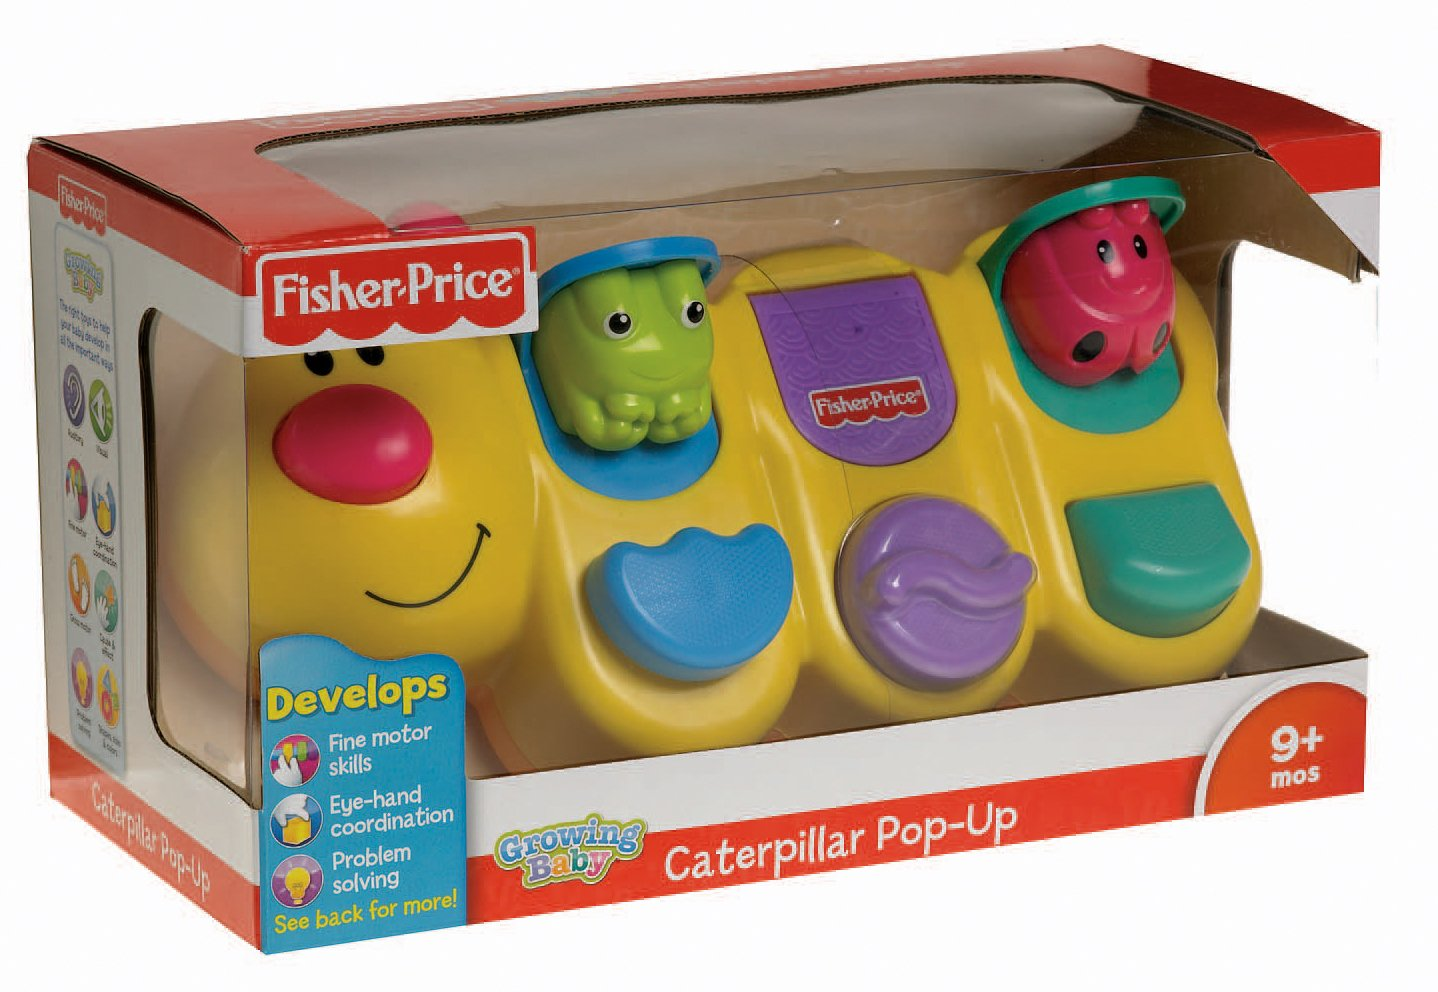 Fisher-Price Growing Baby Caterpillar Pop-Up